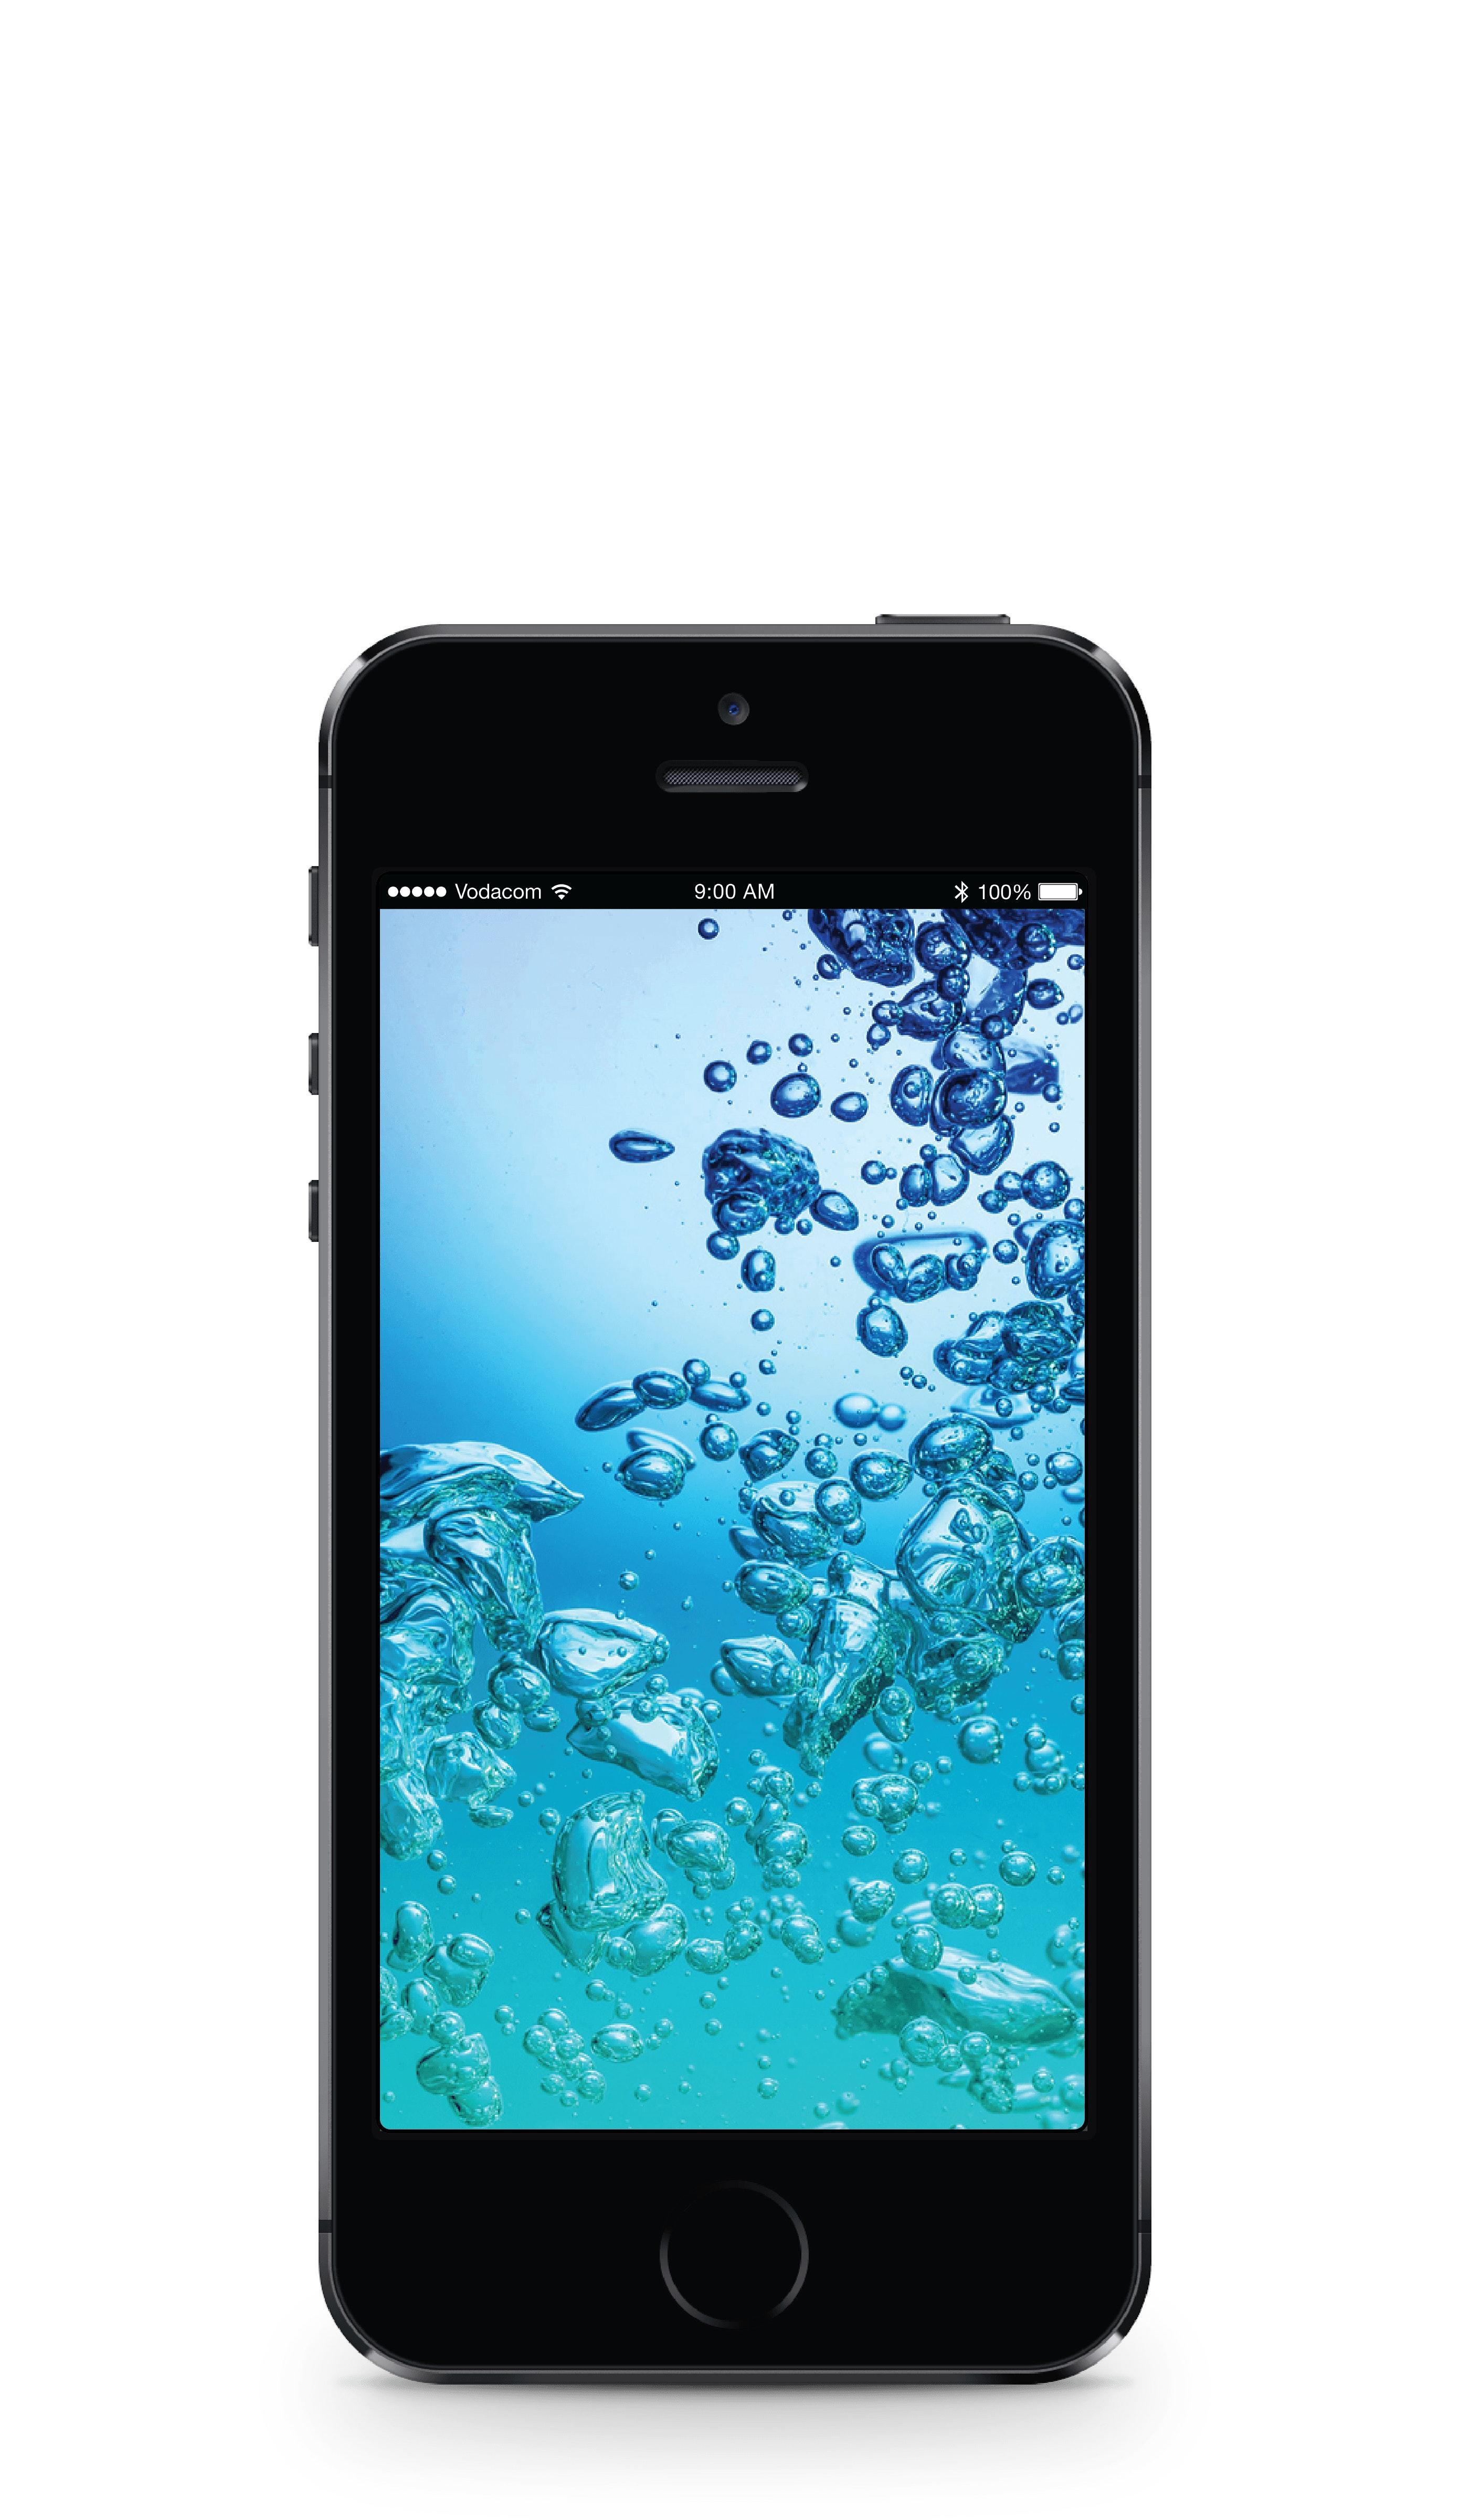 Apple iPhone 5 image